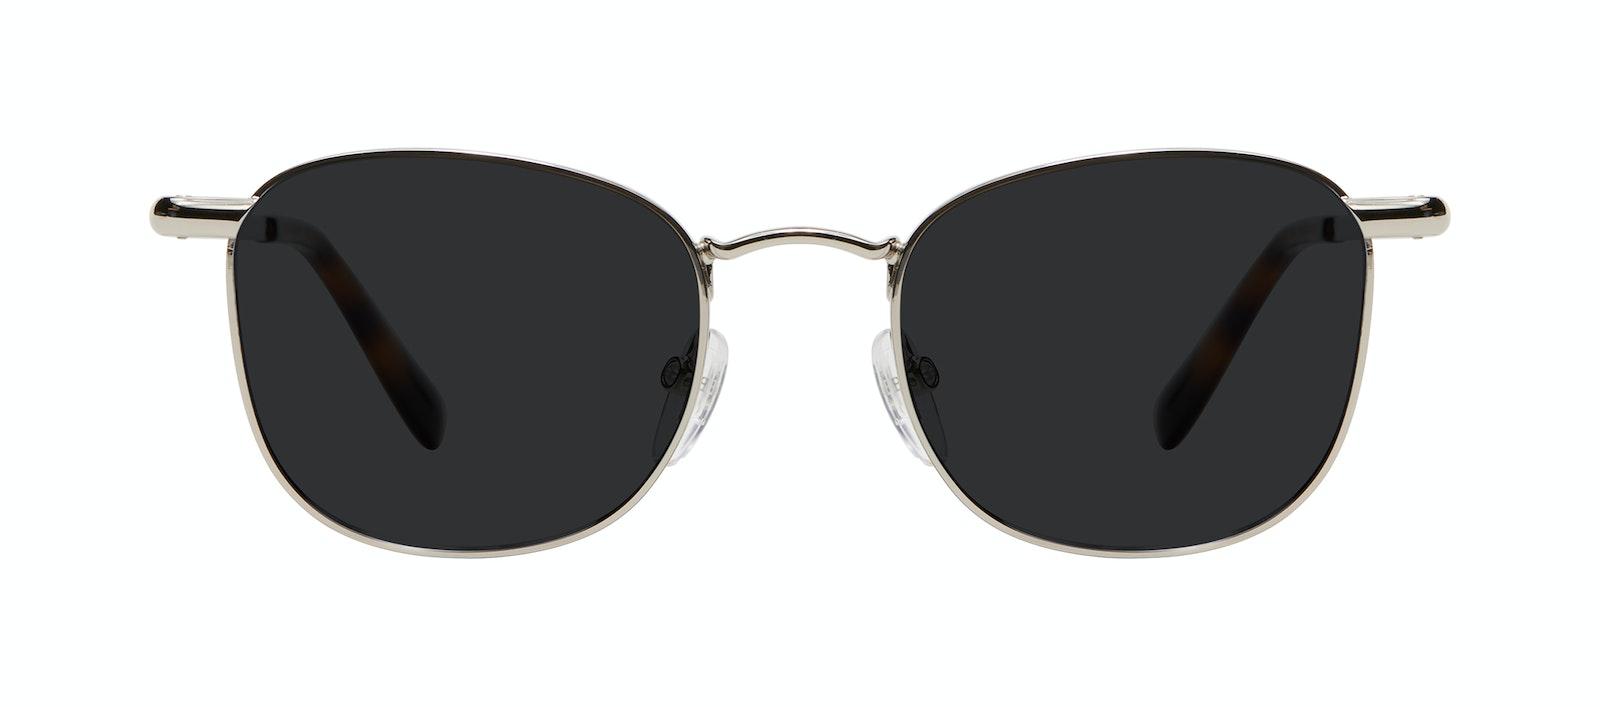 Affordable Fashion Glasses Square Sunglasses Men Women Apex M Silver Front